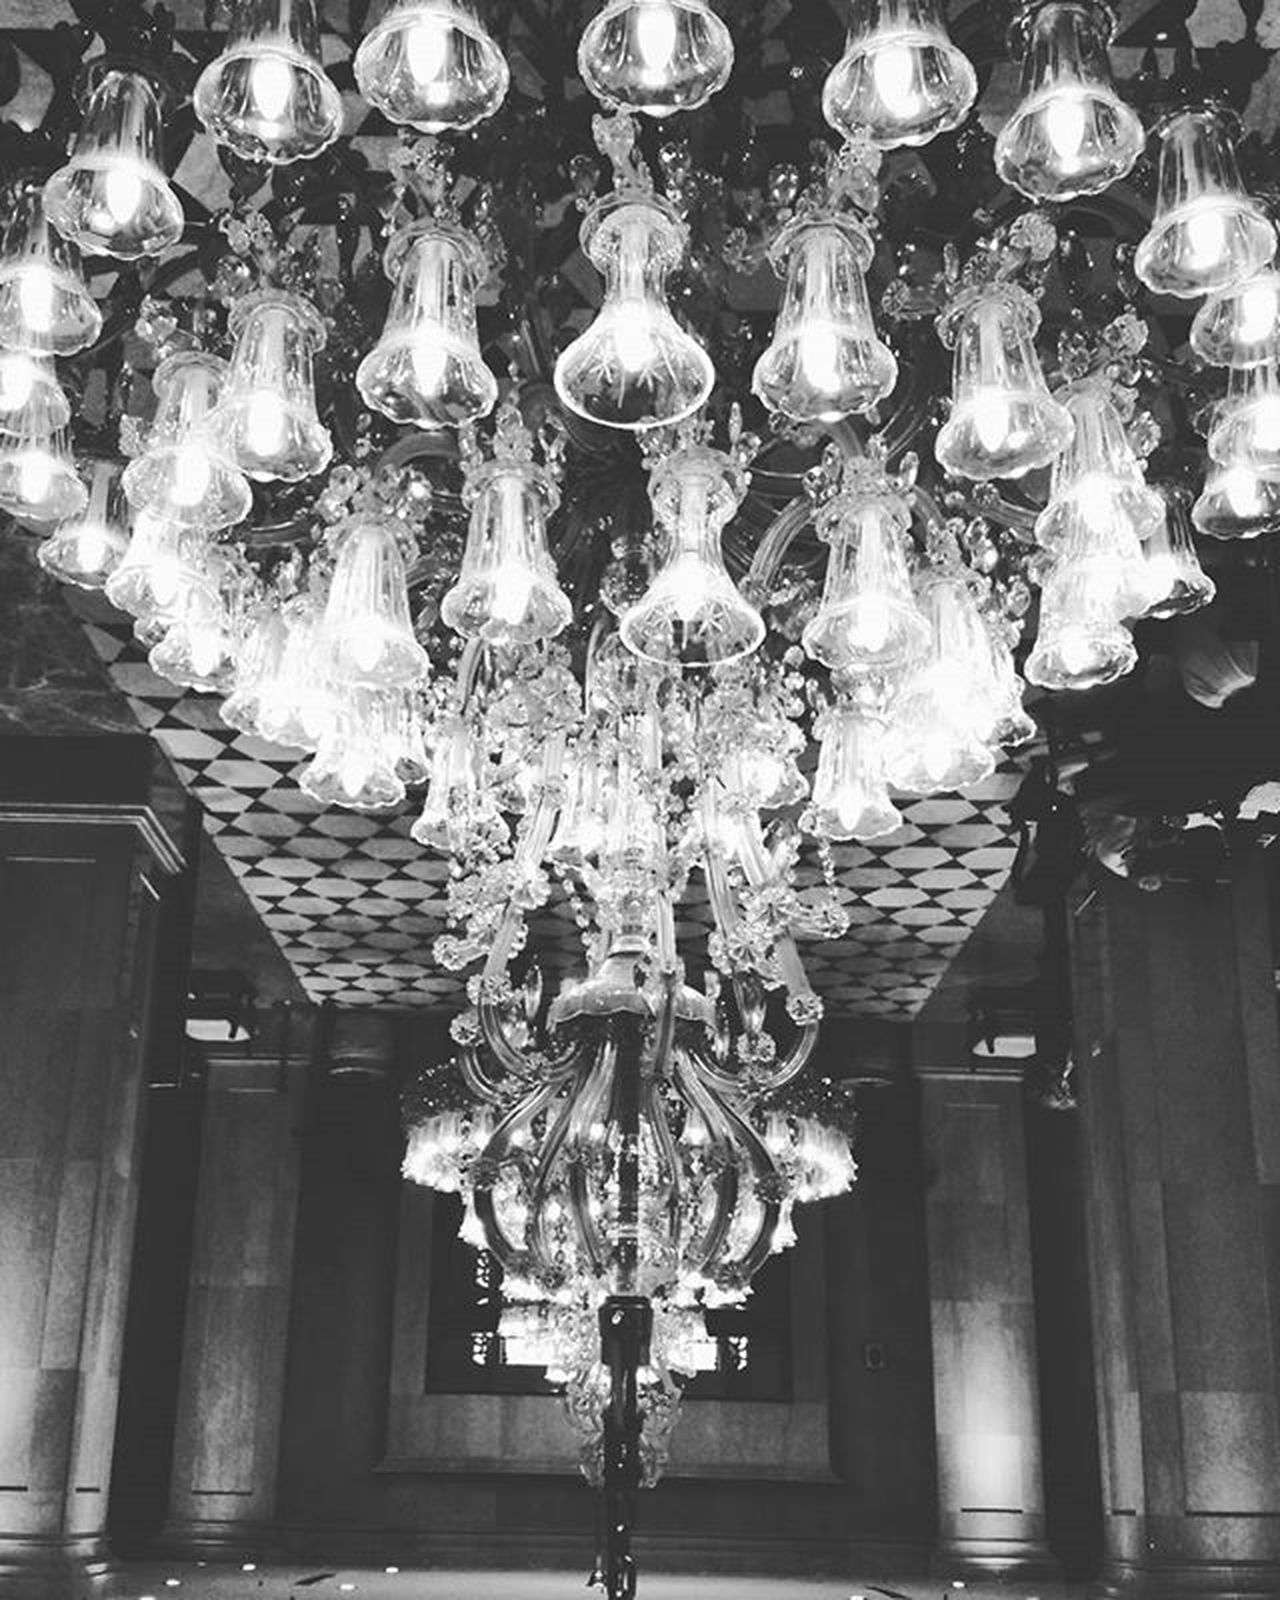 Chandelier Mi4 Mi4photography Mi4phonography Xiaomimi4 Photography Instagram Instagood Instalike Instapic Doubletap India Blackandwhite Blacknwhite Upsidedown Moonfilter Instaedit Beautiful Beauty